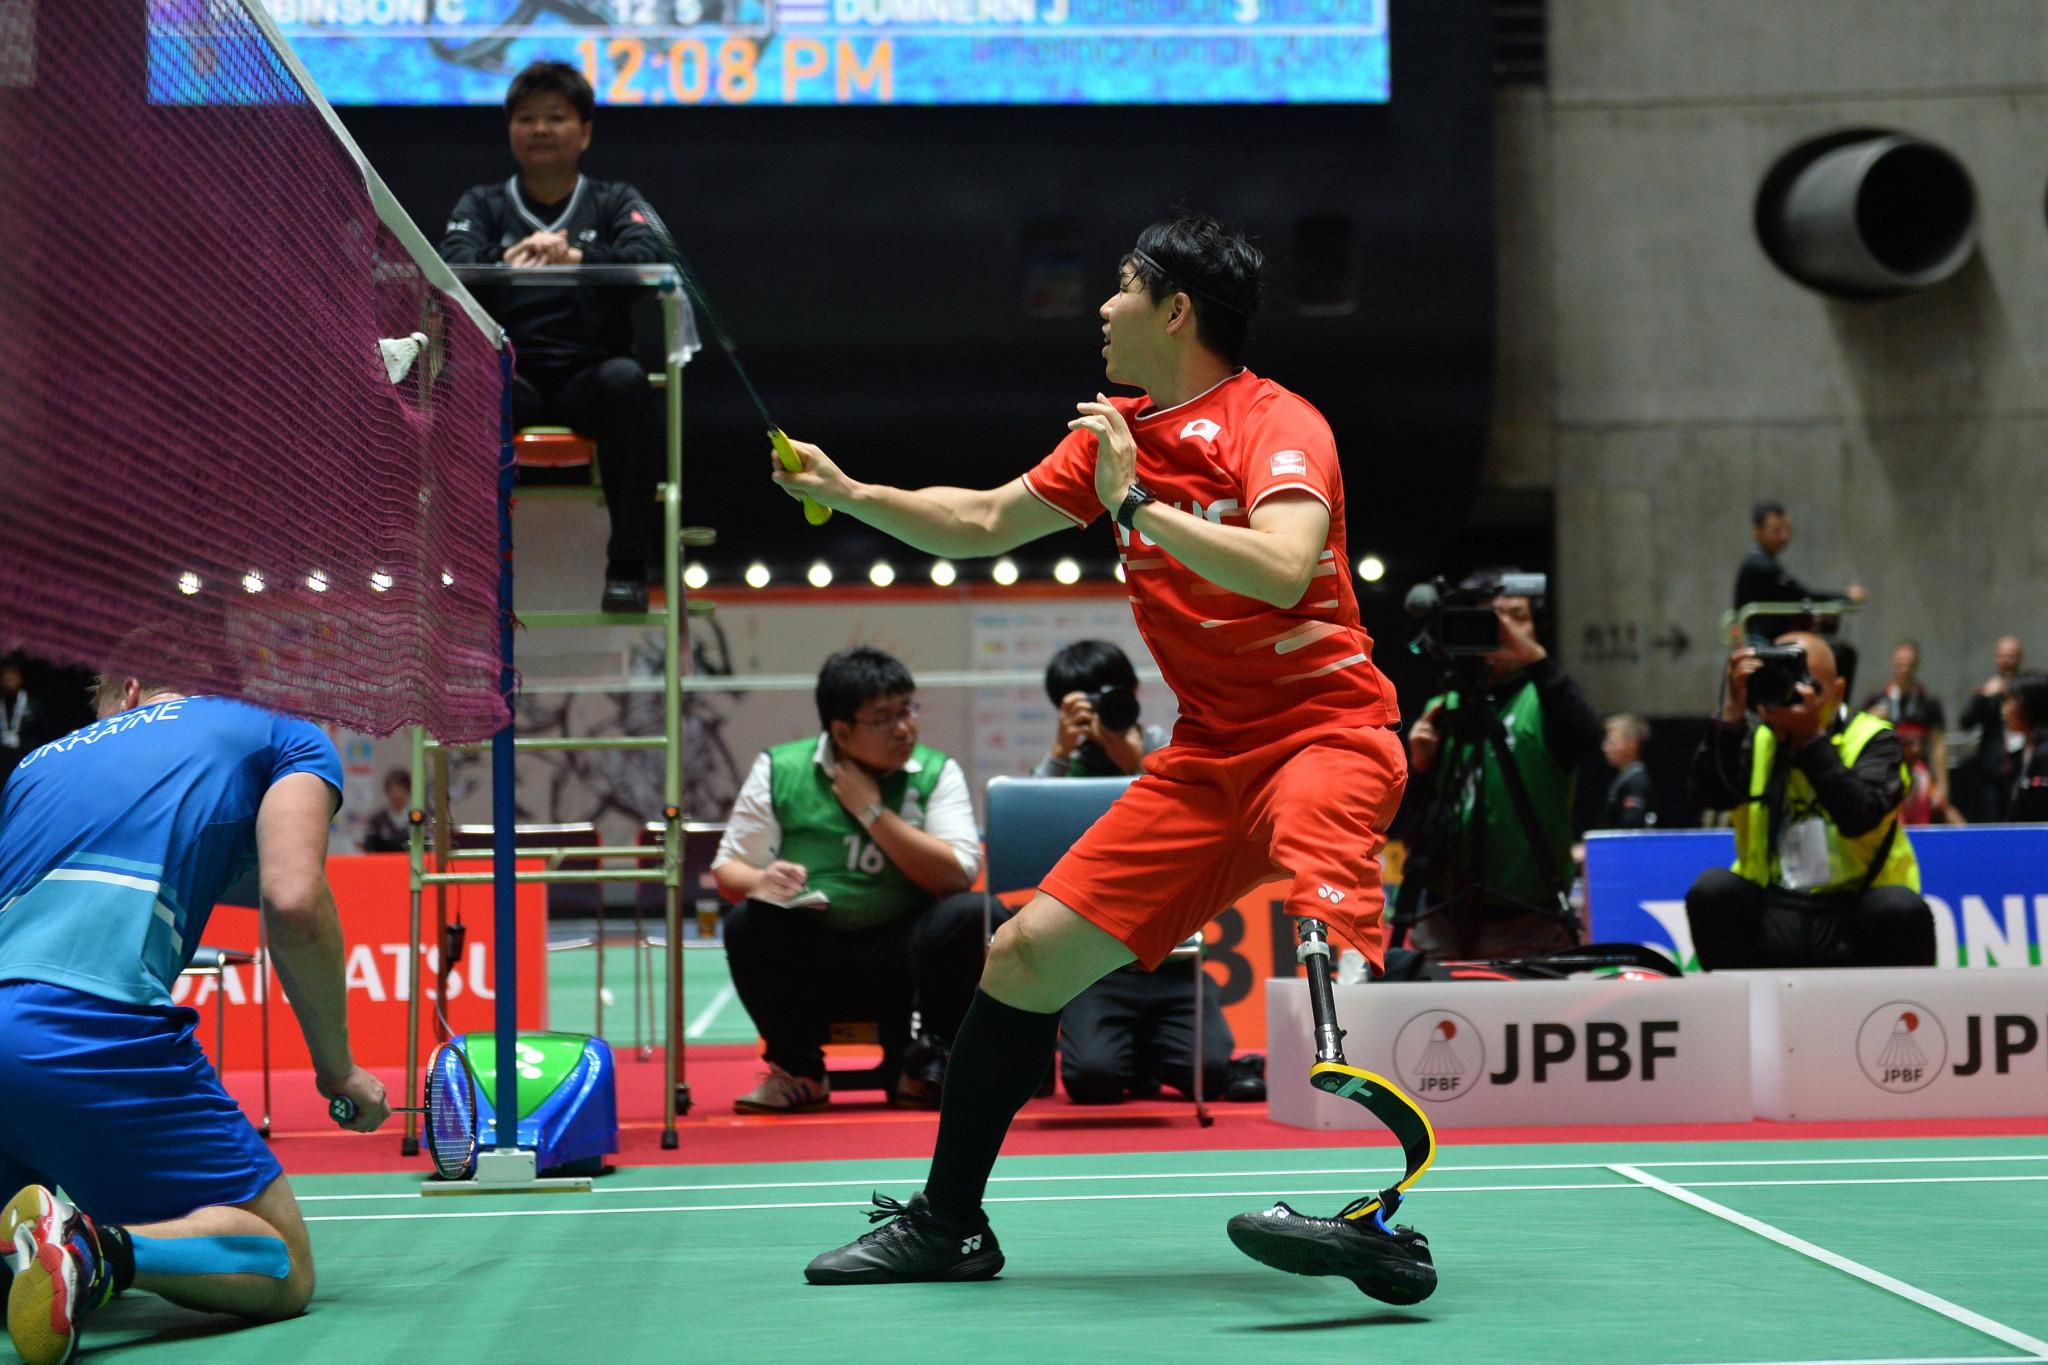 Bhagat to meet Bethell in Tokyo 2020 Para-badminton test event final